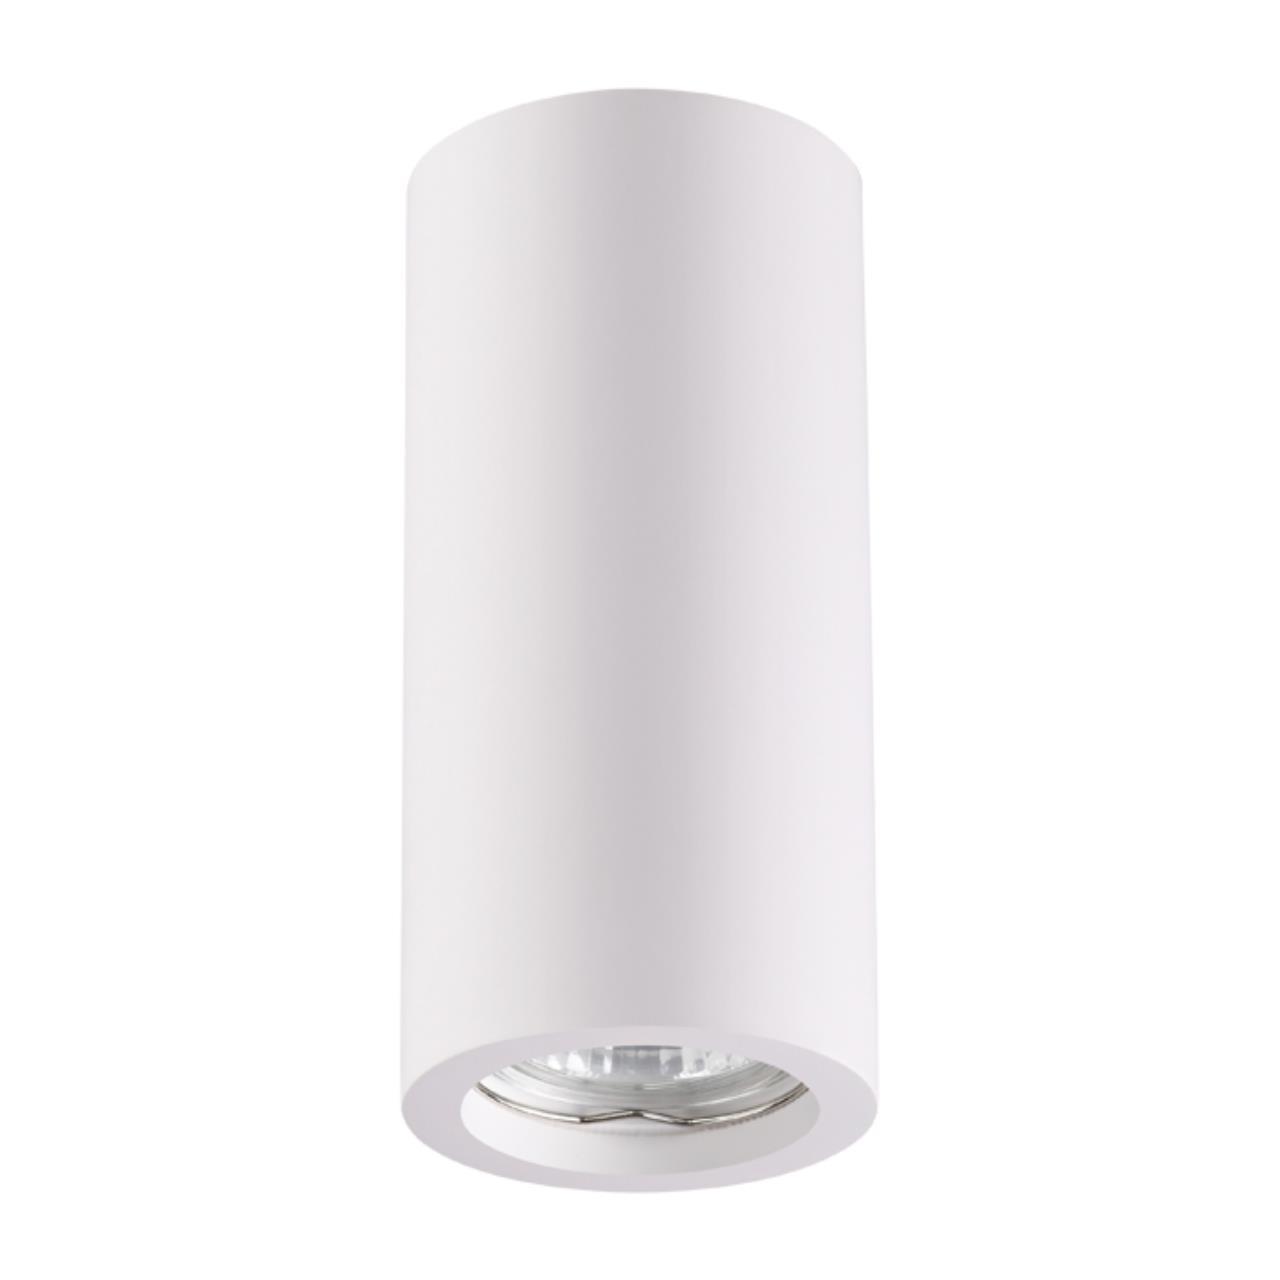 370465 OVER NT19 041 белый Накладной светильник IP20 GU10 50W 220V YESO